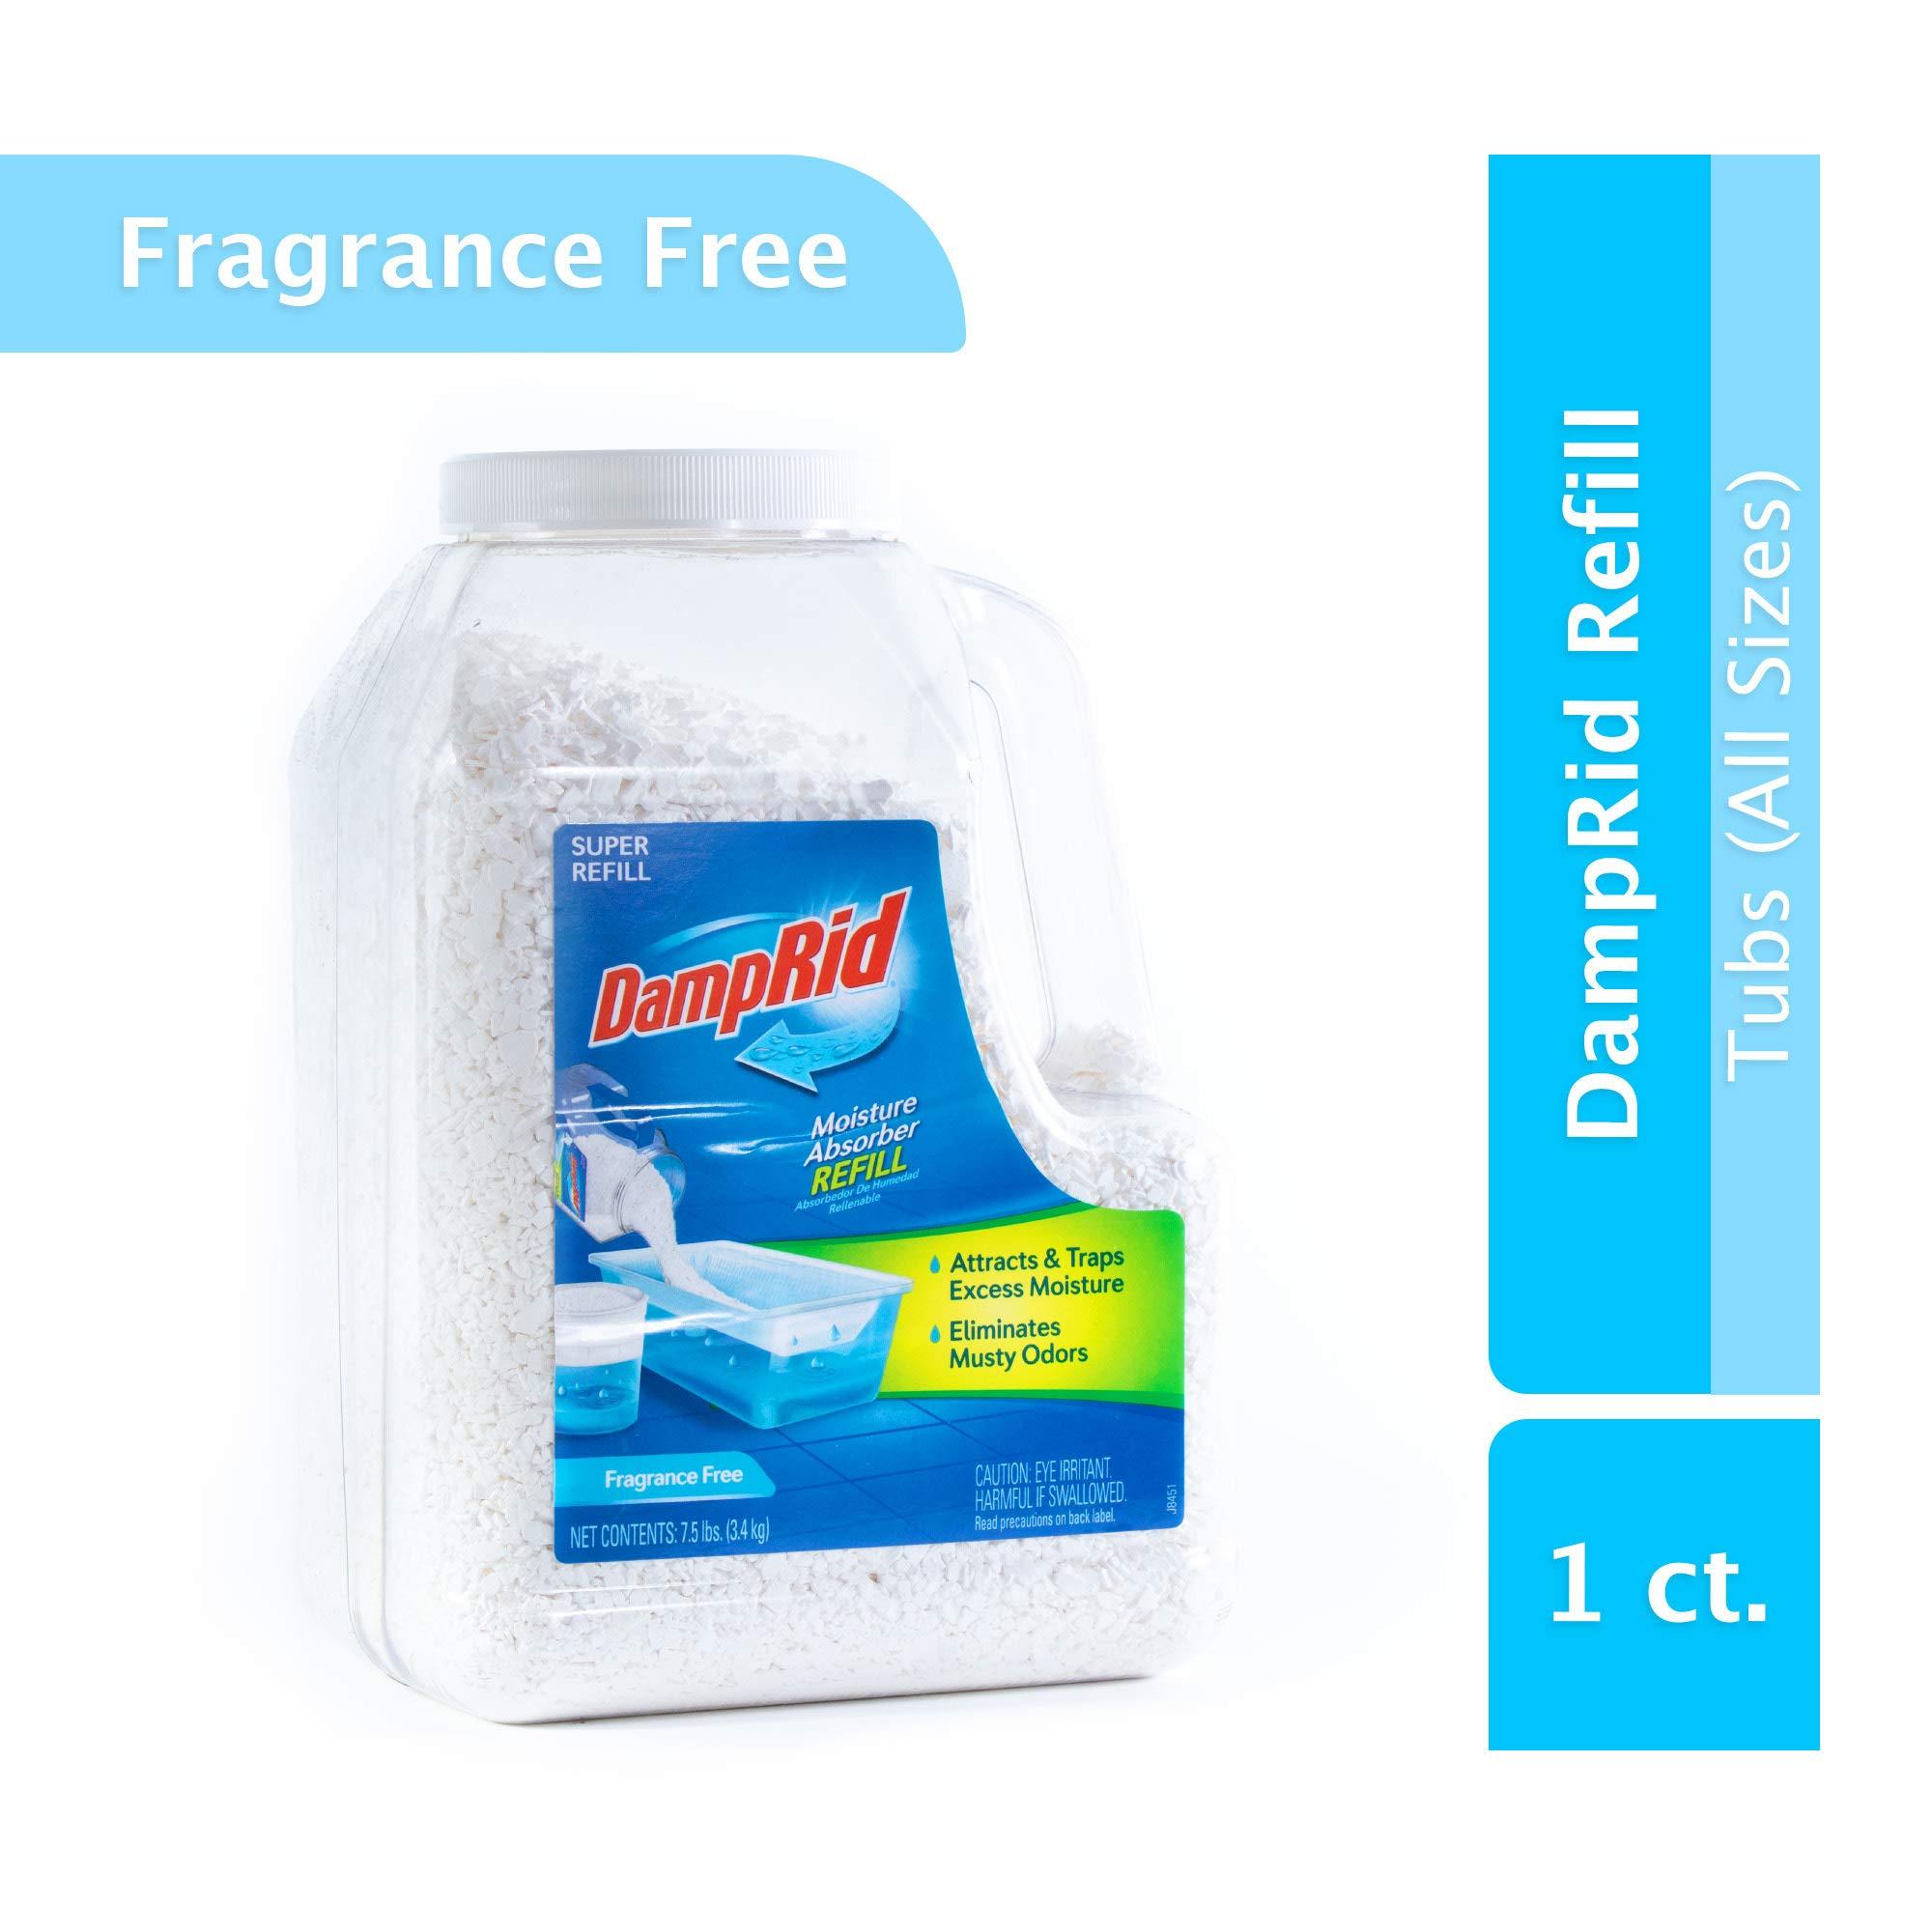 DampRid FG37 Moisture Absorber, 7.5 lb, Fragrance Free by DampRid